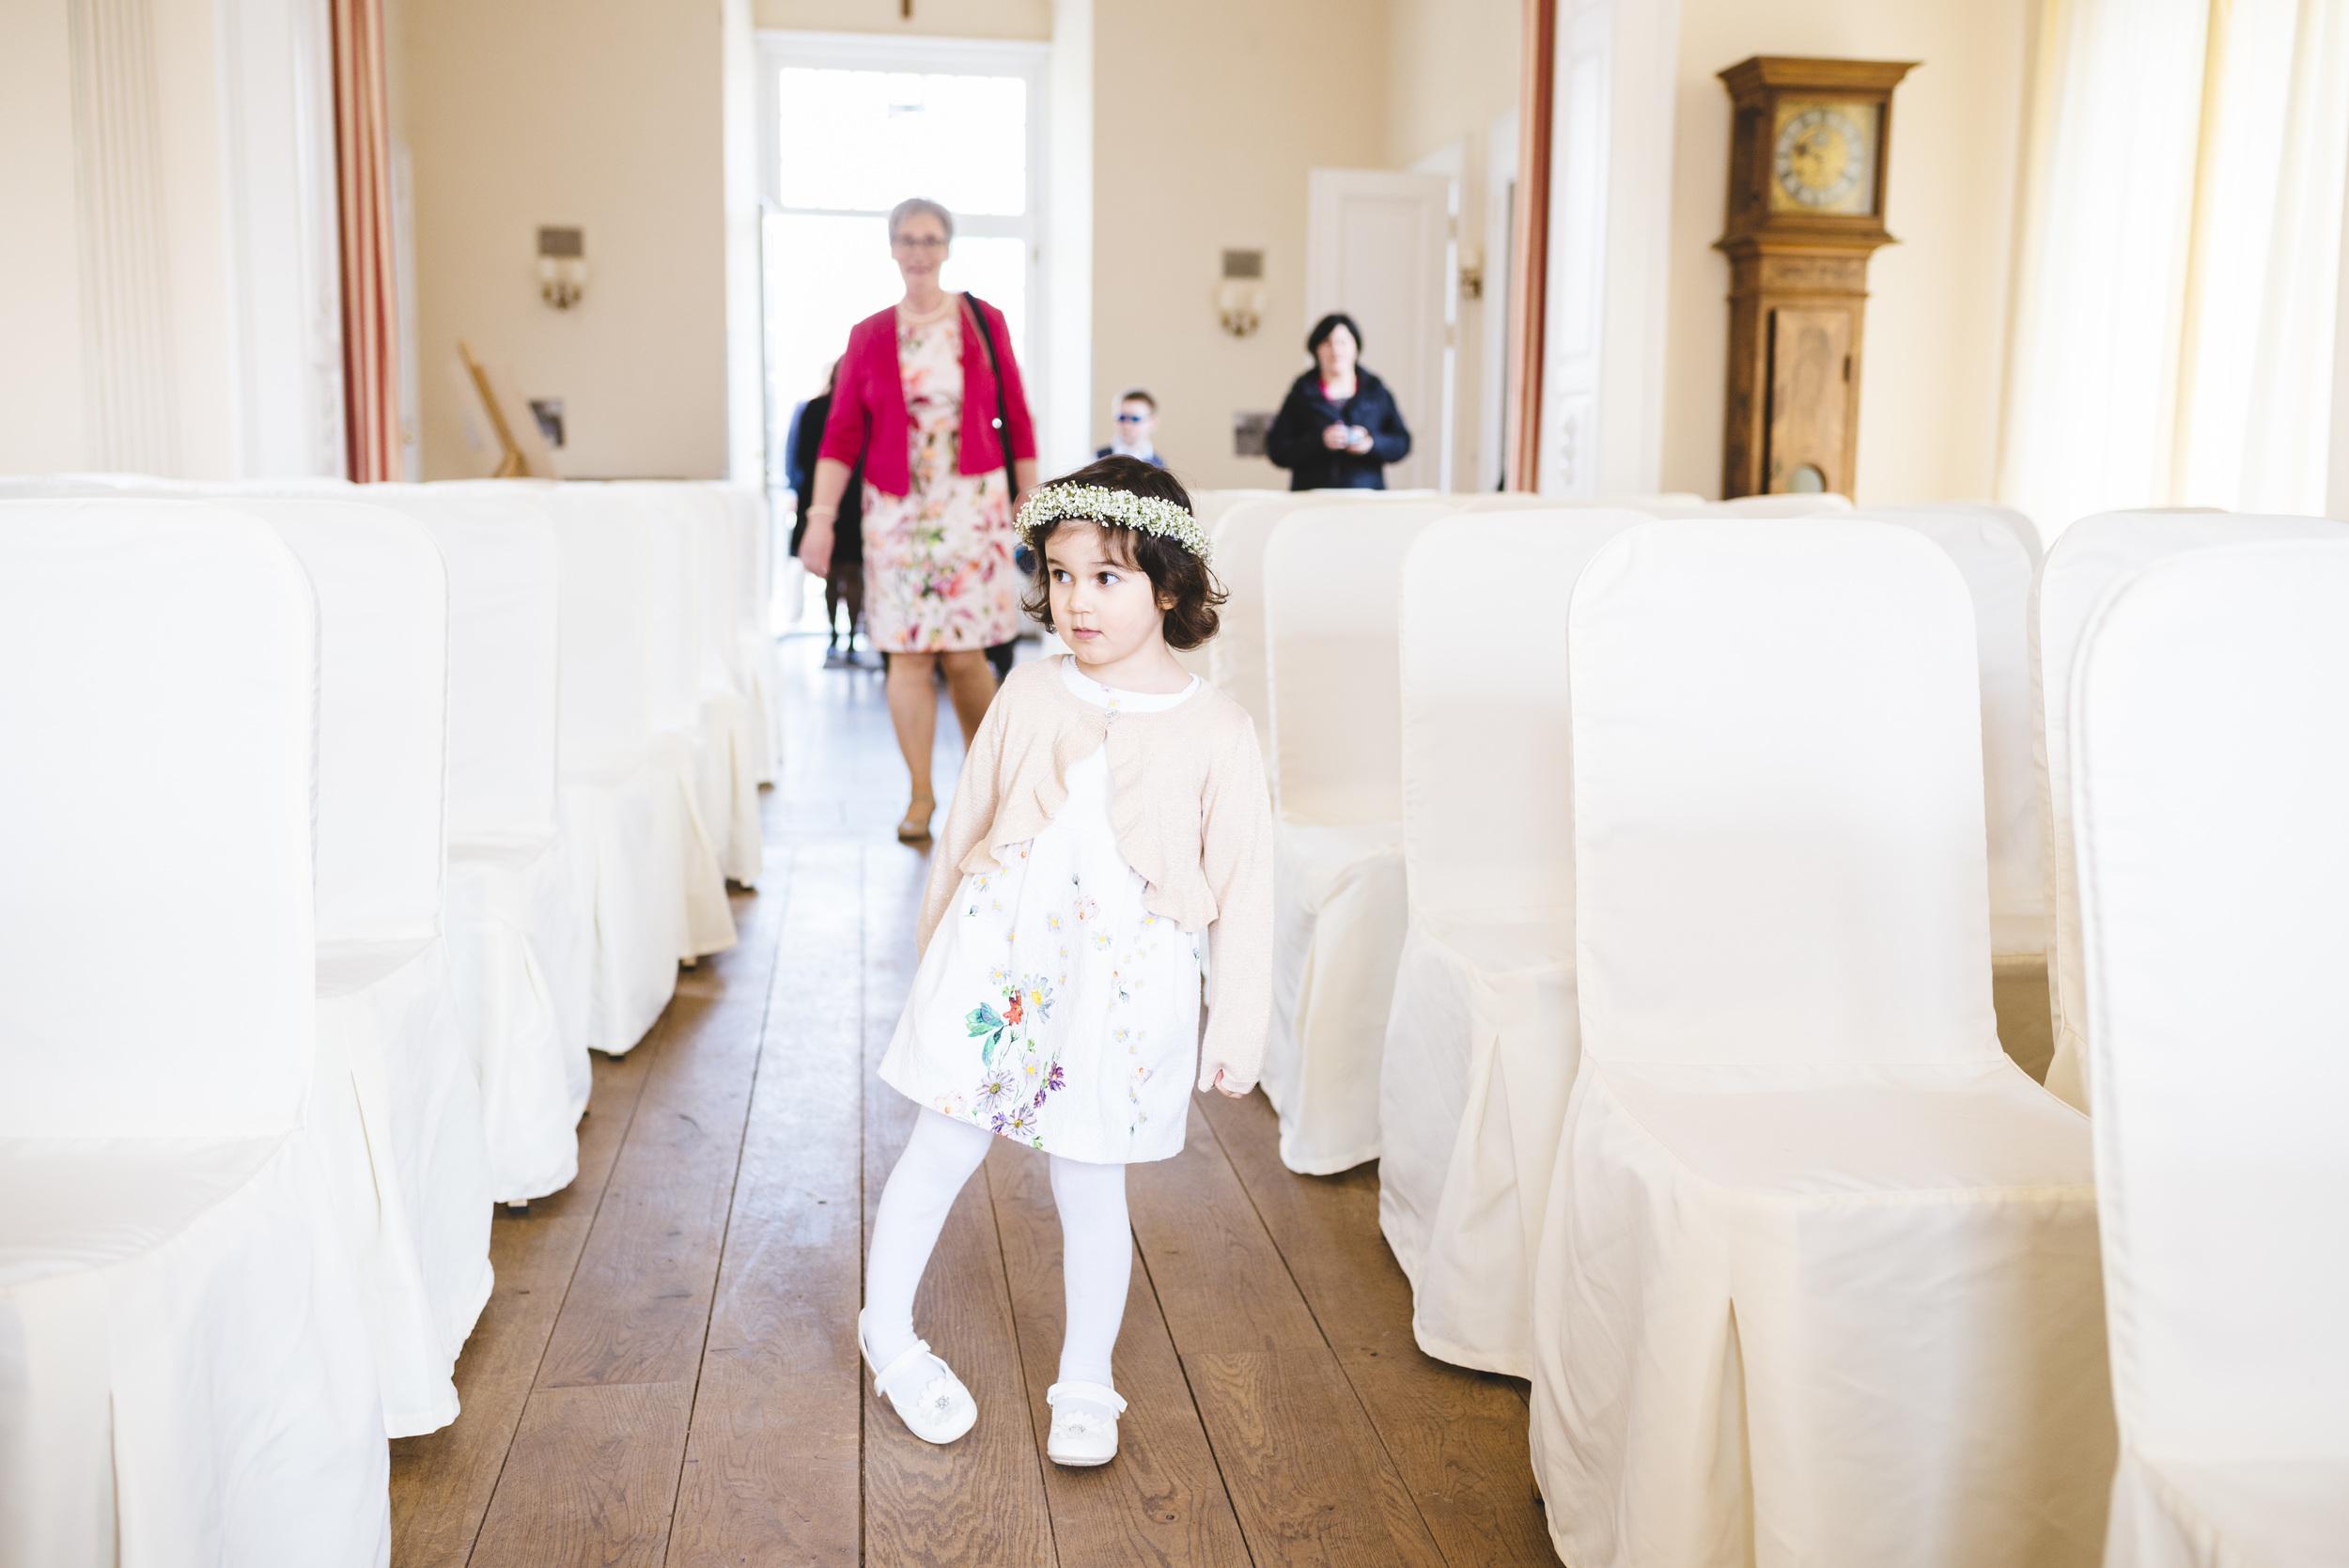 Hochzeitsfotograf-Schlossruine-Hertefeld-Weeze-061.jpg